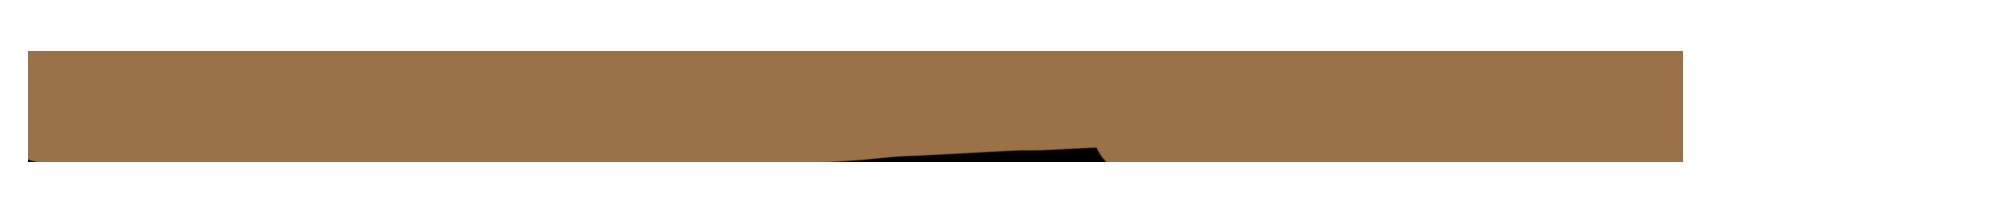 logo of Hospitality & Wellness Mobile App